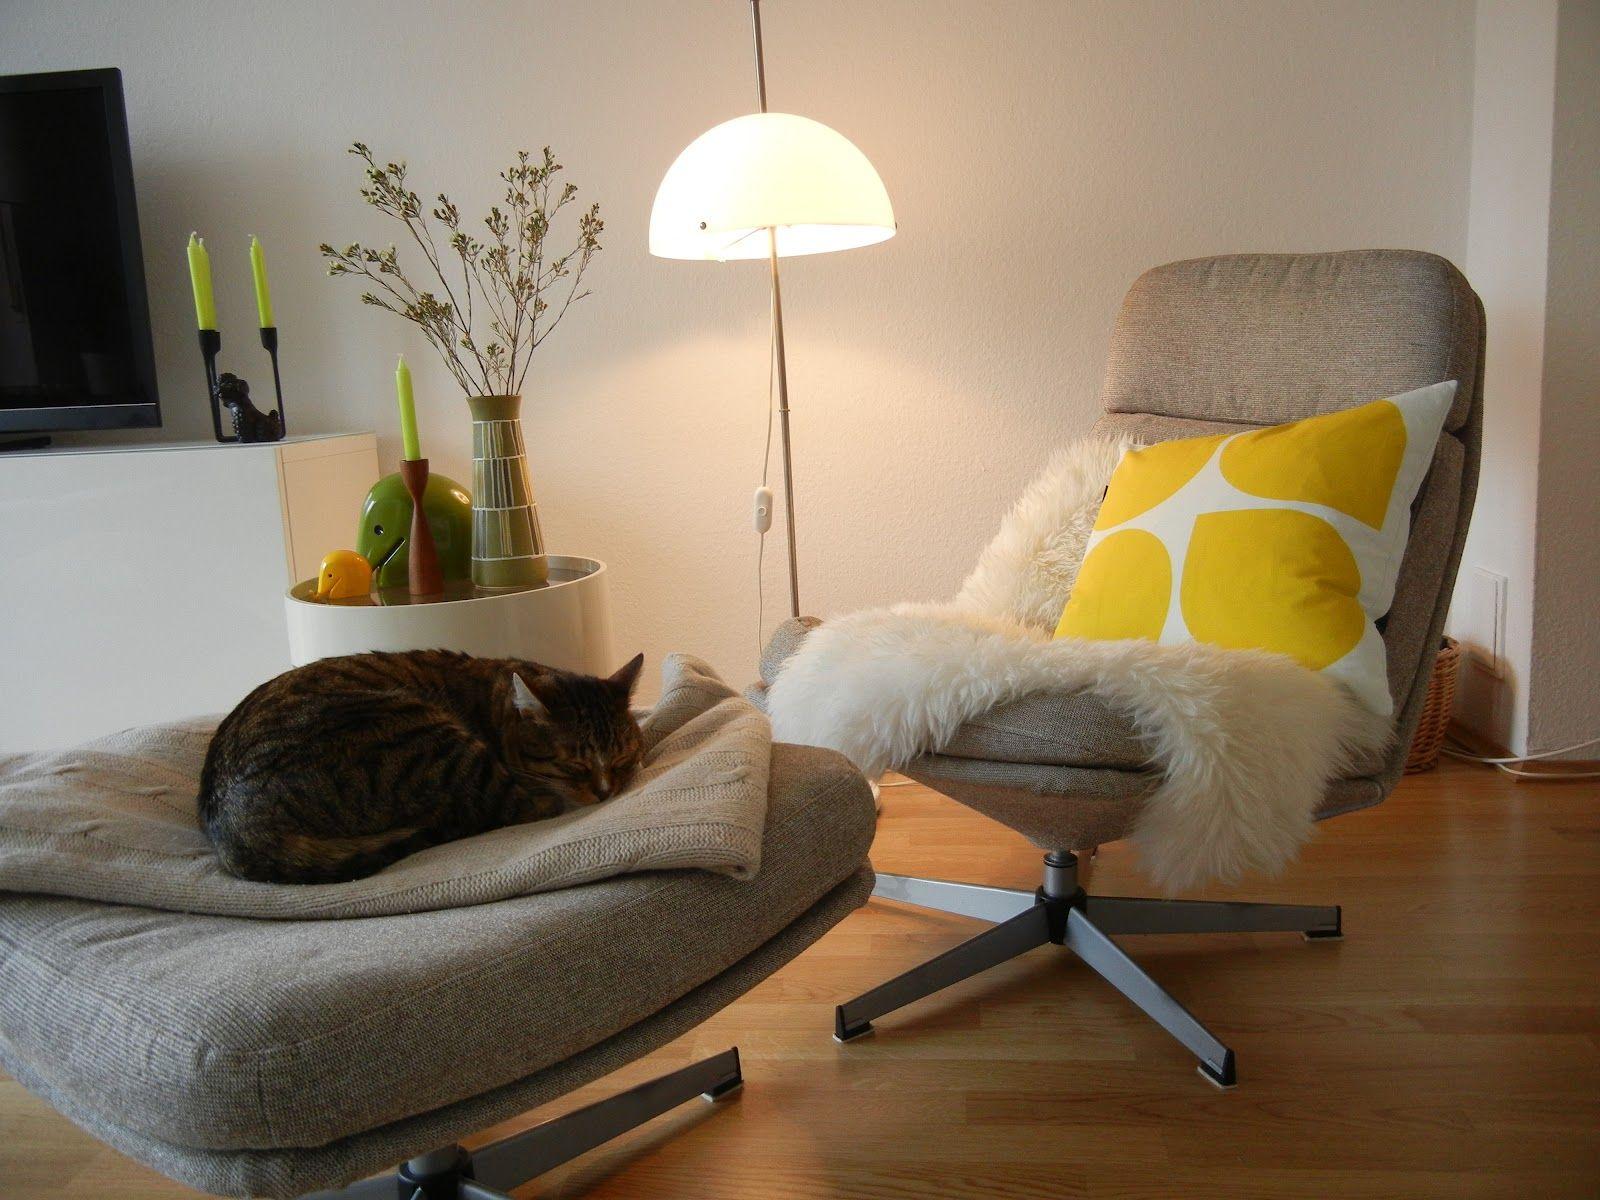 Ikea Lunna Draaistoel.Retired Ikea Lunna Chair Last Year Sold Was 2008 Huisdecoratie